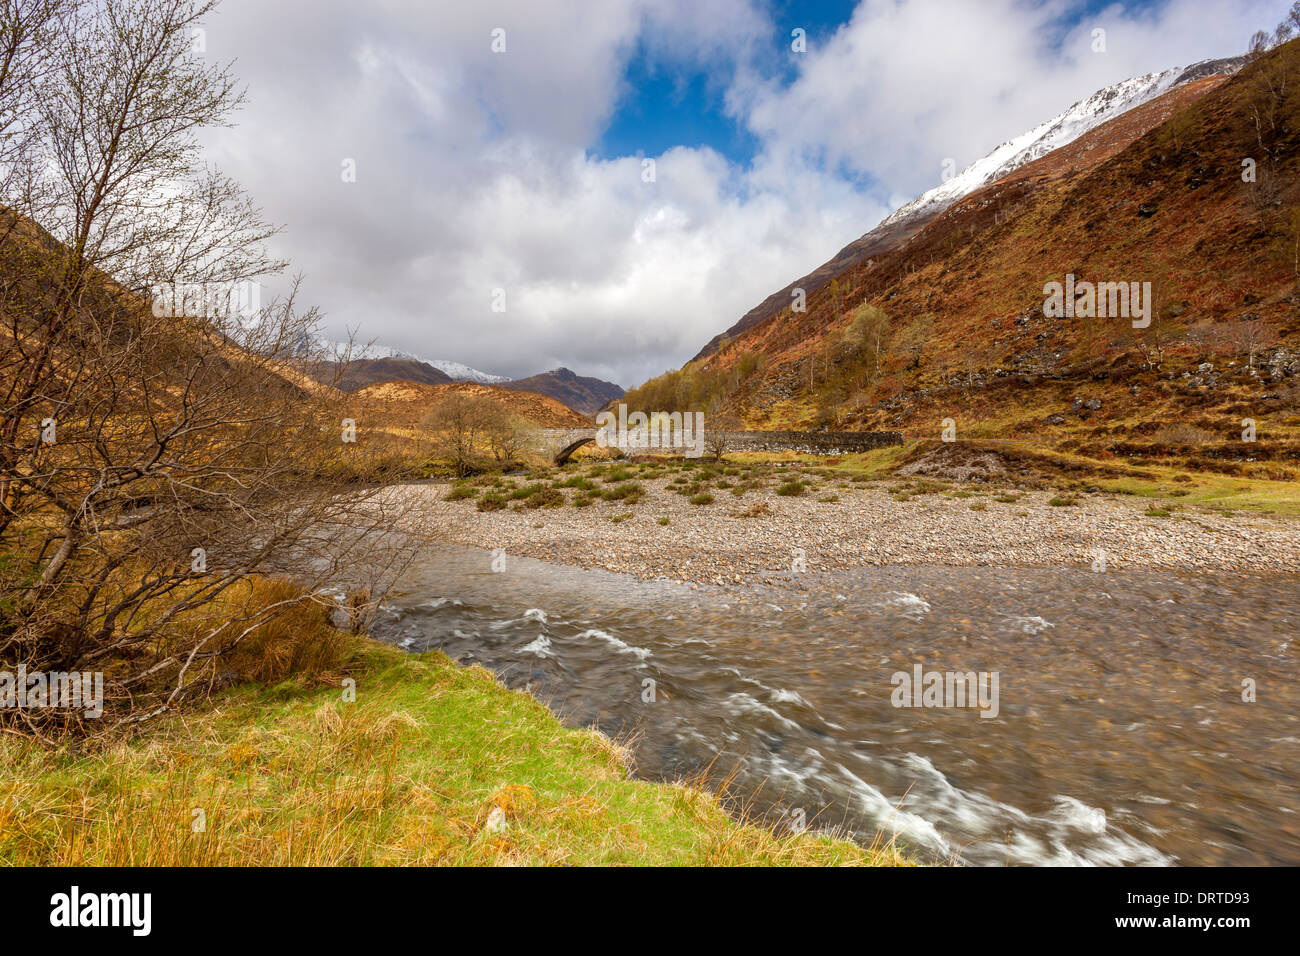 Eas-nan-Arm Bridge over River Shiel in Glen Shiel (near to the location of the 1719 battle site), north west Highland, Scotland. Stock Photo